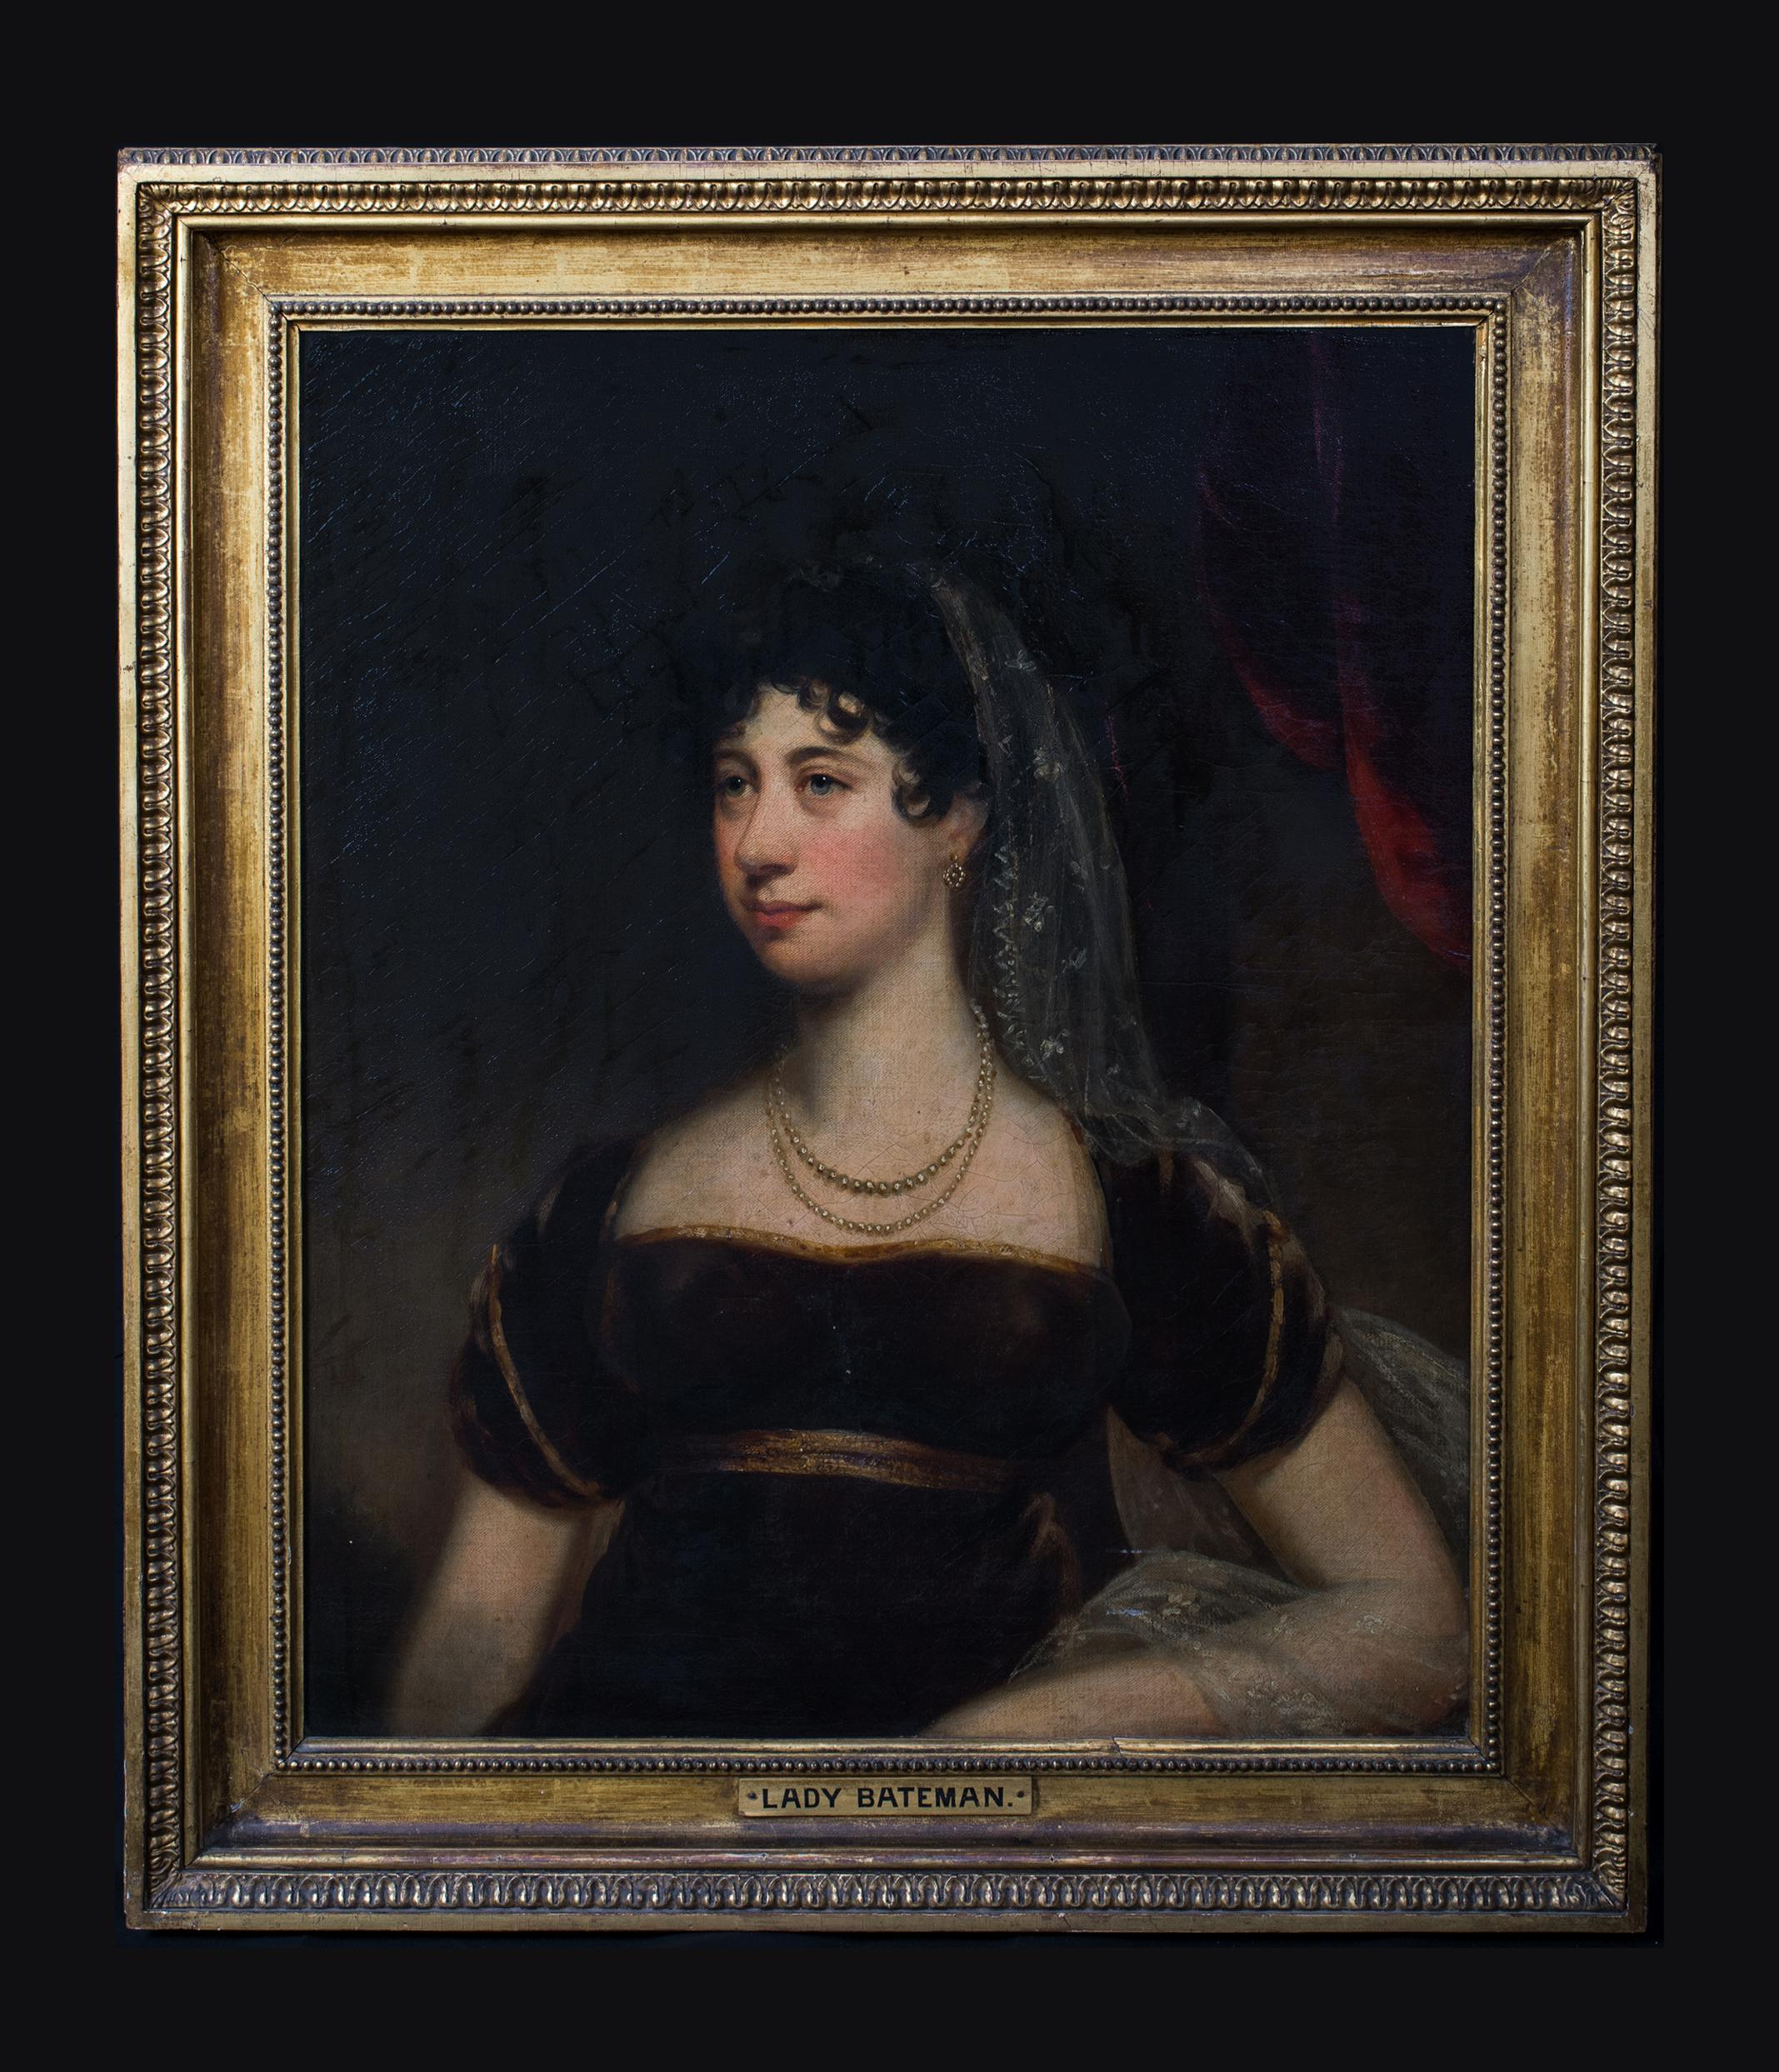 Portrait of Lady Bateman, 19th Century